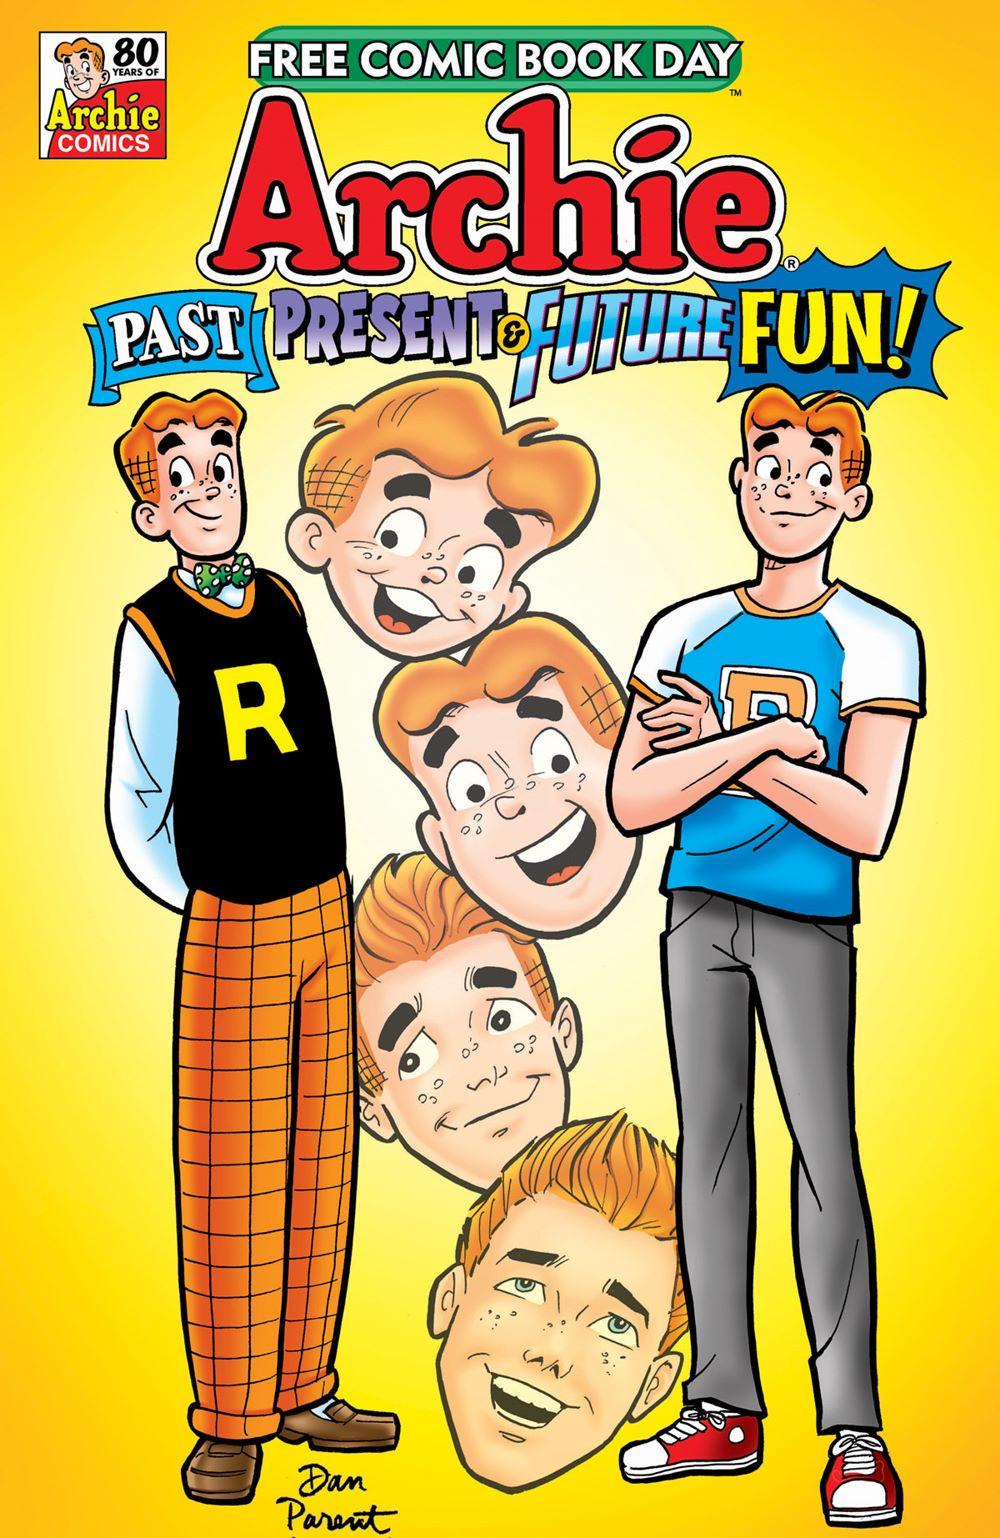 FCBD21_GOLD_Archie_Past-Present-Future-Fun Free Comic Book Day 2021 Gold Sponsor Comic Books announced